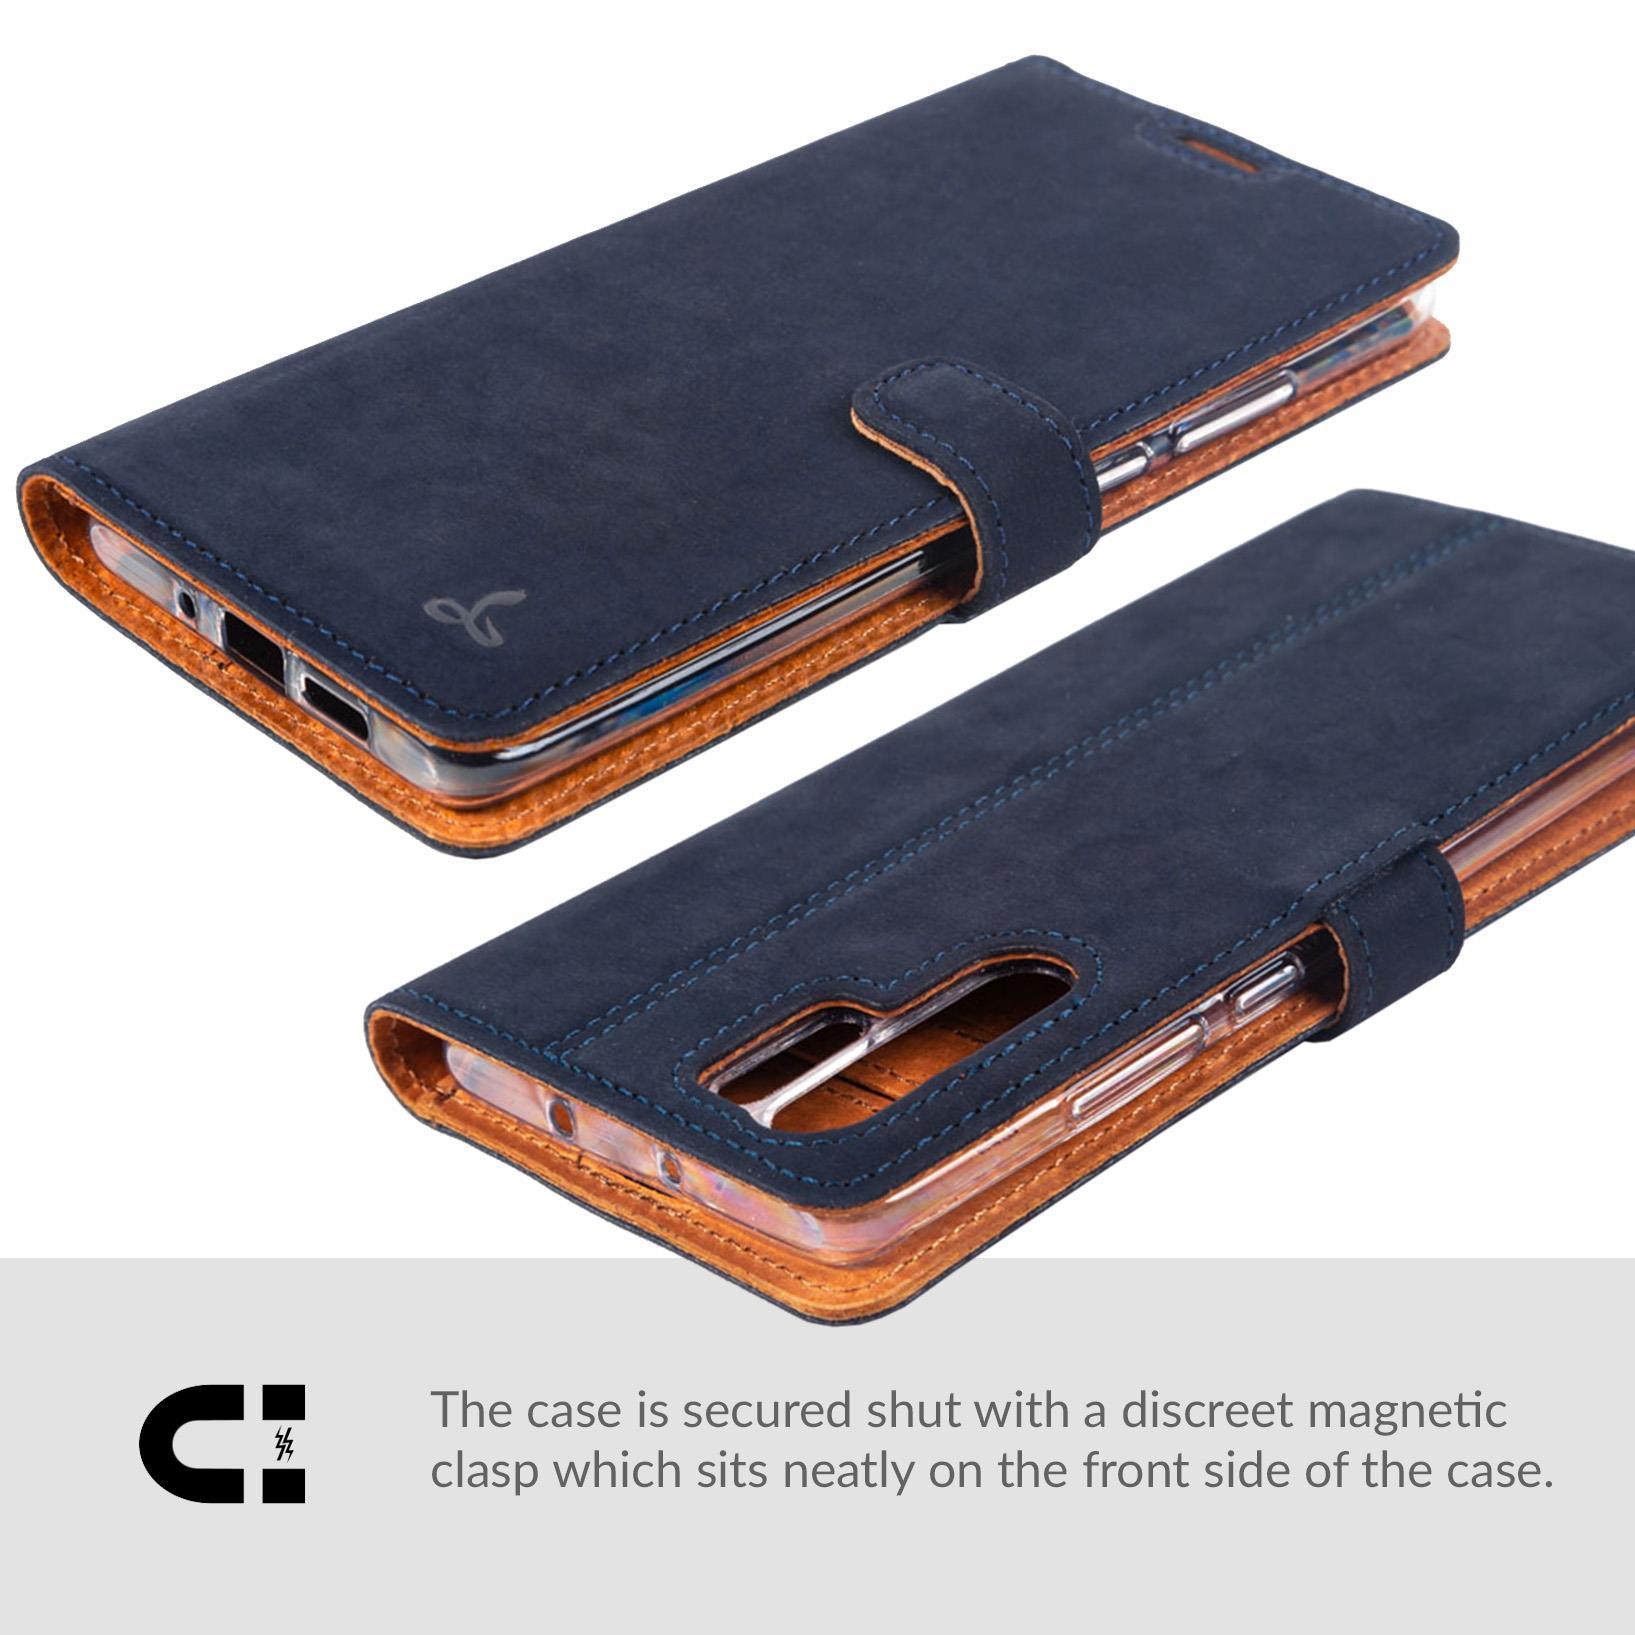 Snakehive-Huawei-P30-Pro-Premium-Genuine-Leather-Wallet-Case-w-Card-Slots thumbnail 12